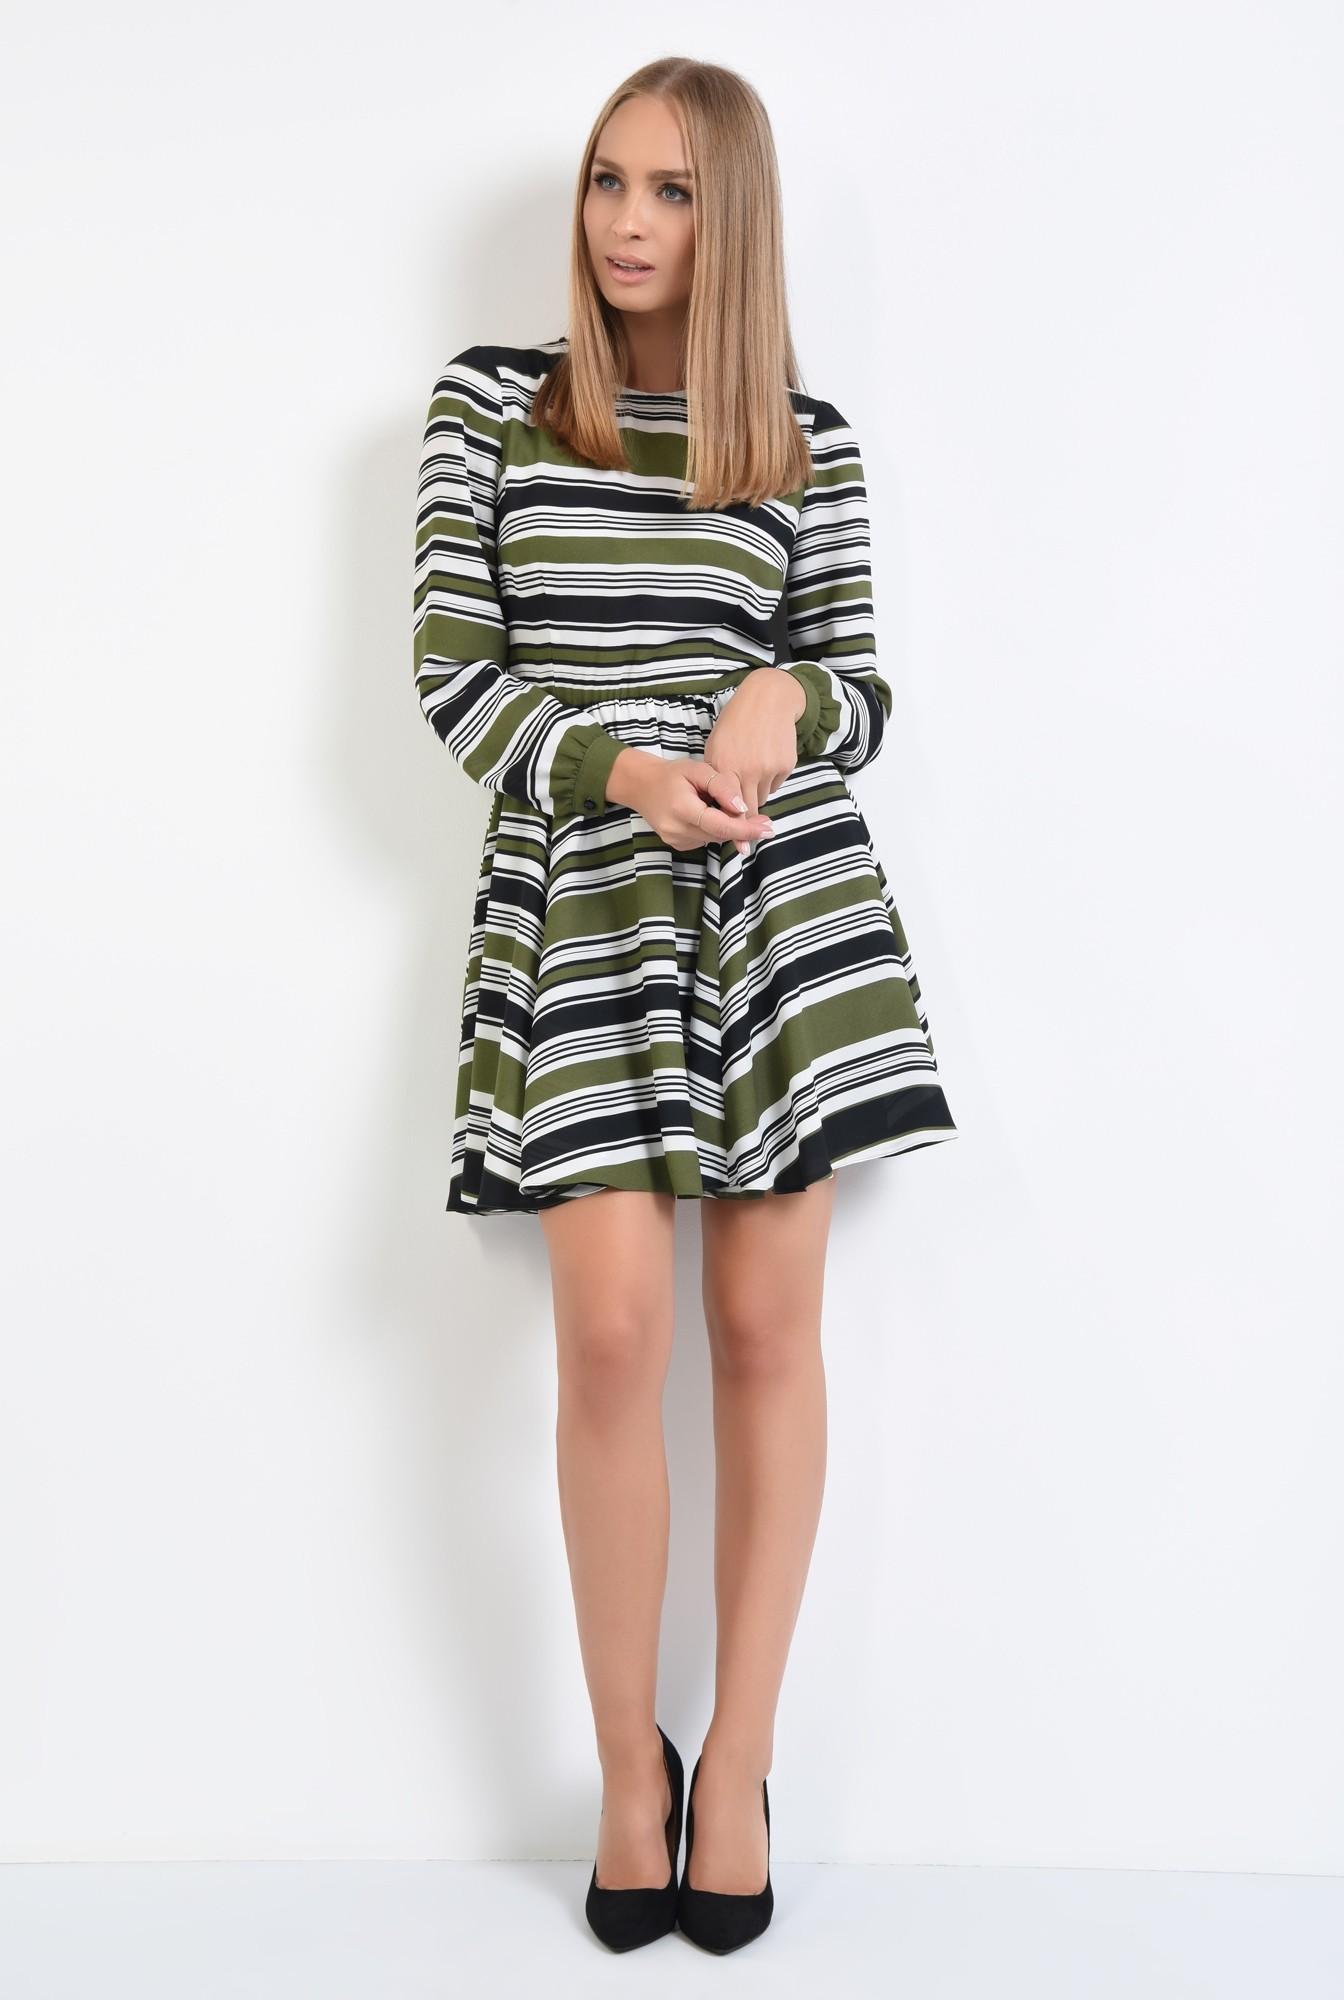 3 - rochie casual, talie pe elastic, decolteu rotund la baza gatului, rochii online